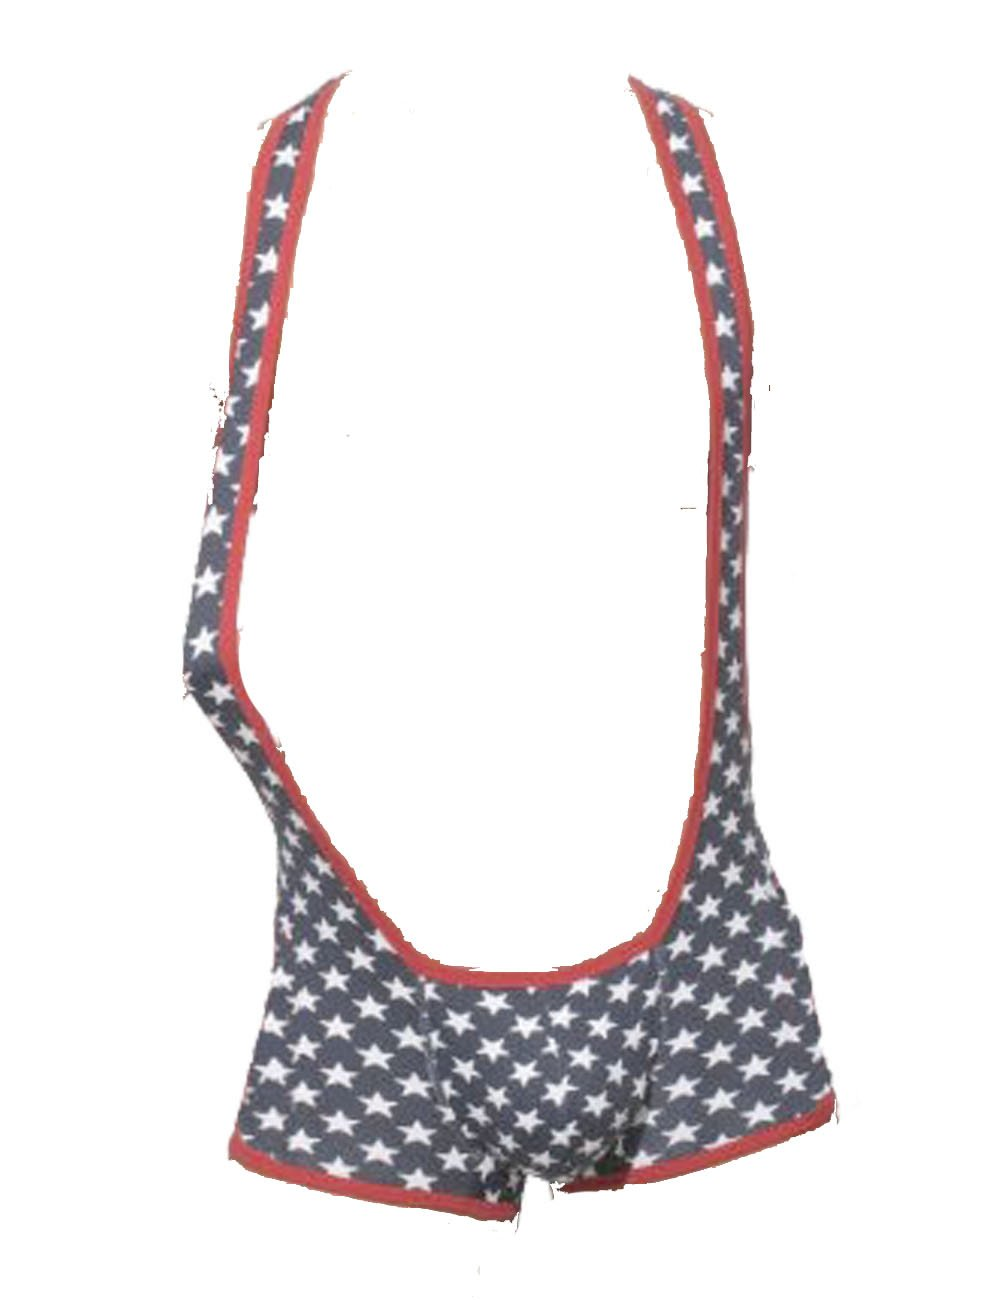 K-Men Men American Flag Lingerie Underwear Pant Jockstrap Thong Pouch G-String M